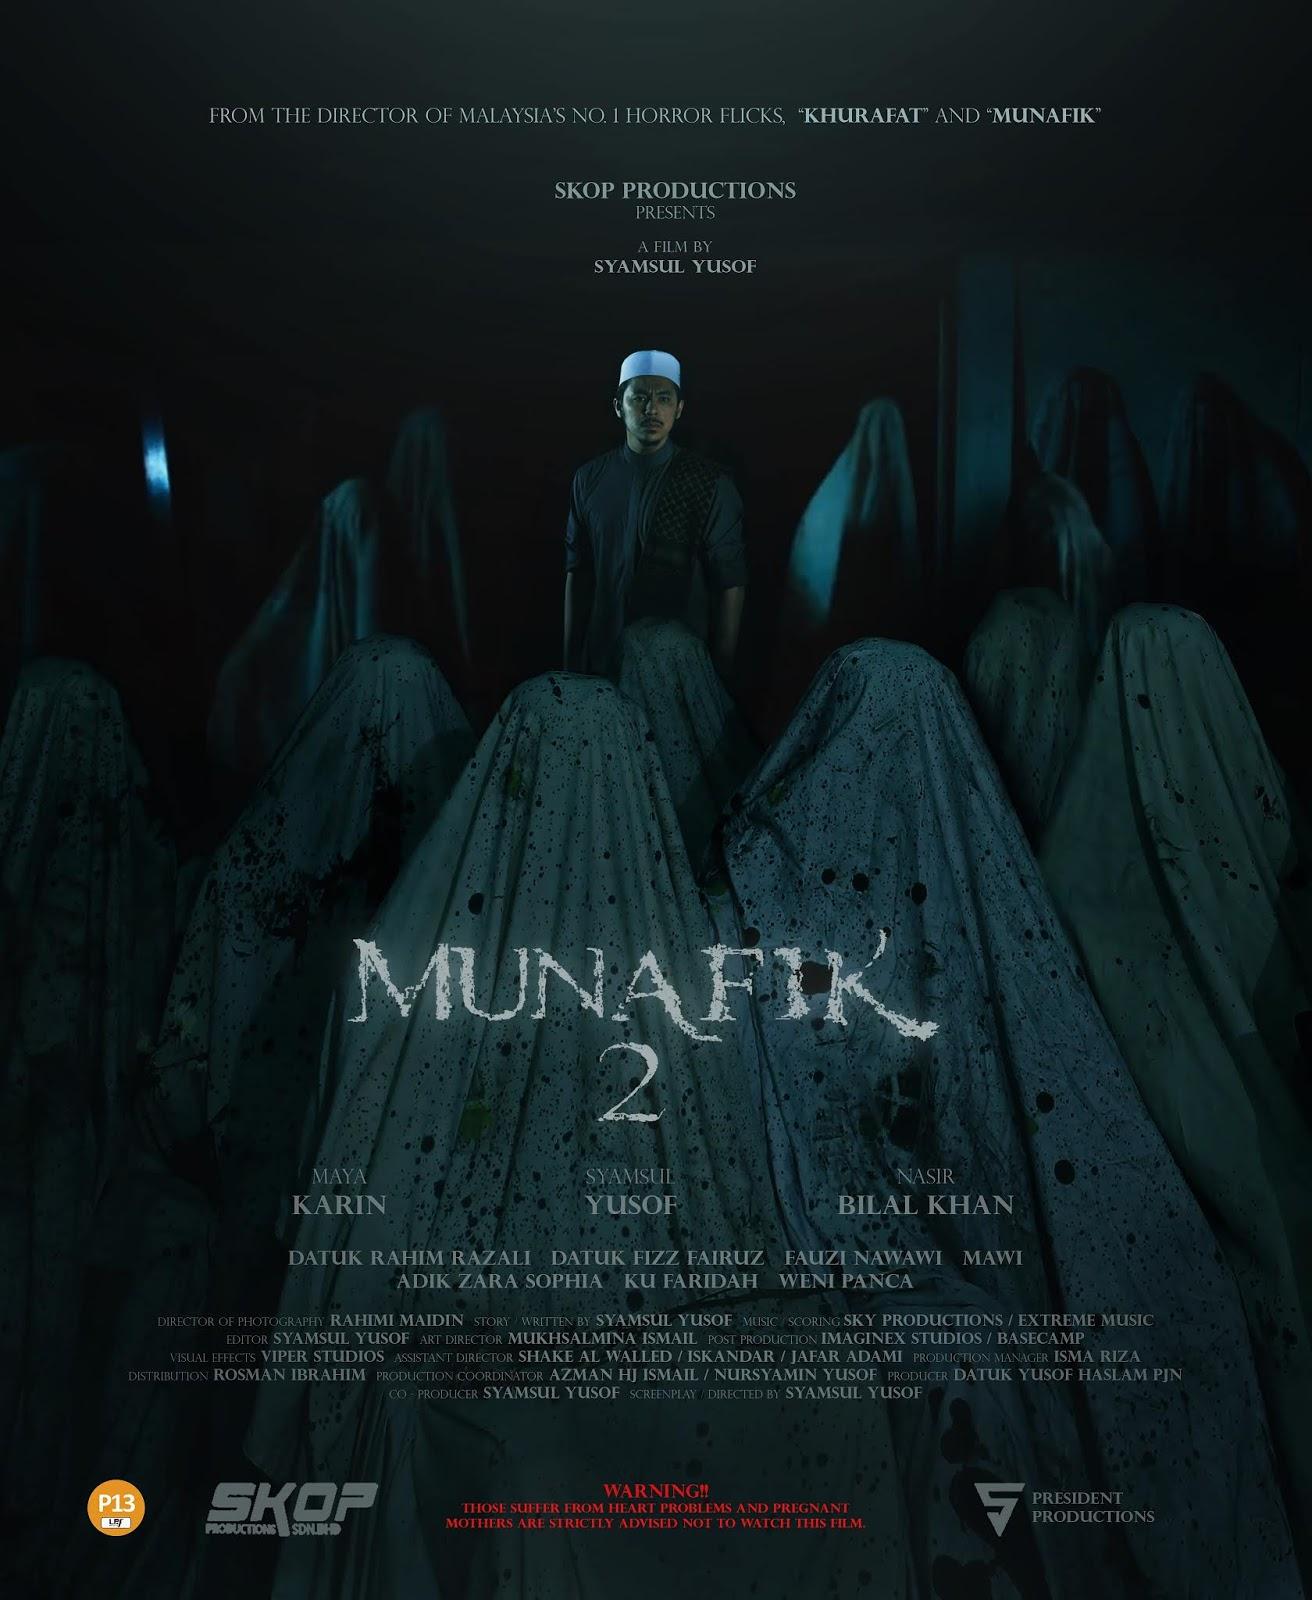 Munafik 1 Full Movie : munafik, movie, BECOME, POWERFUL, VICTORY:, FAVORITE, MOVIE